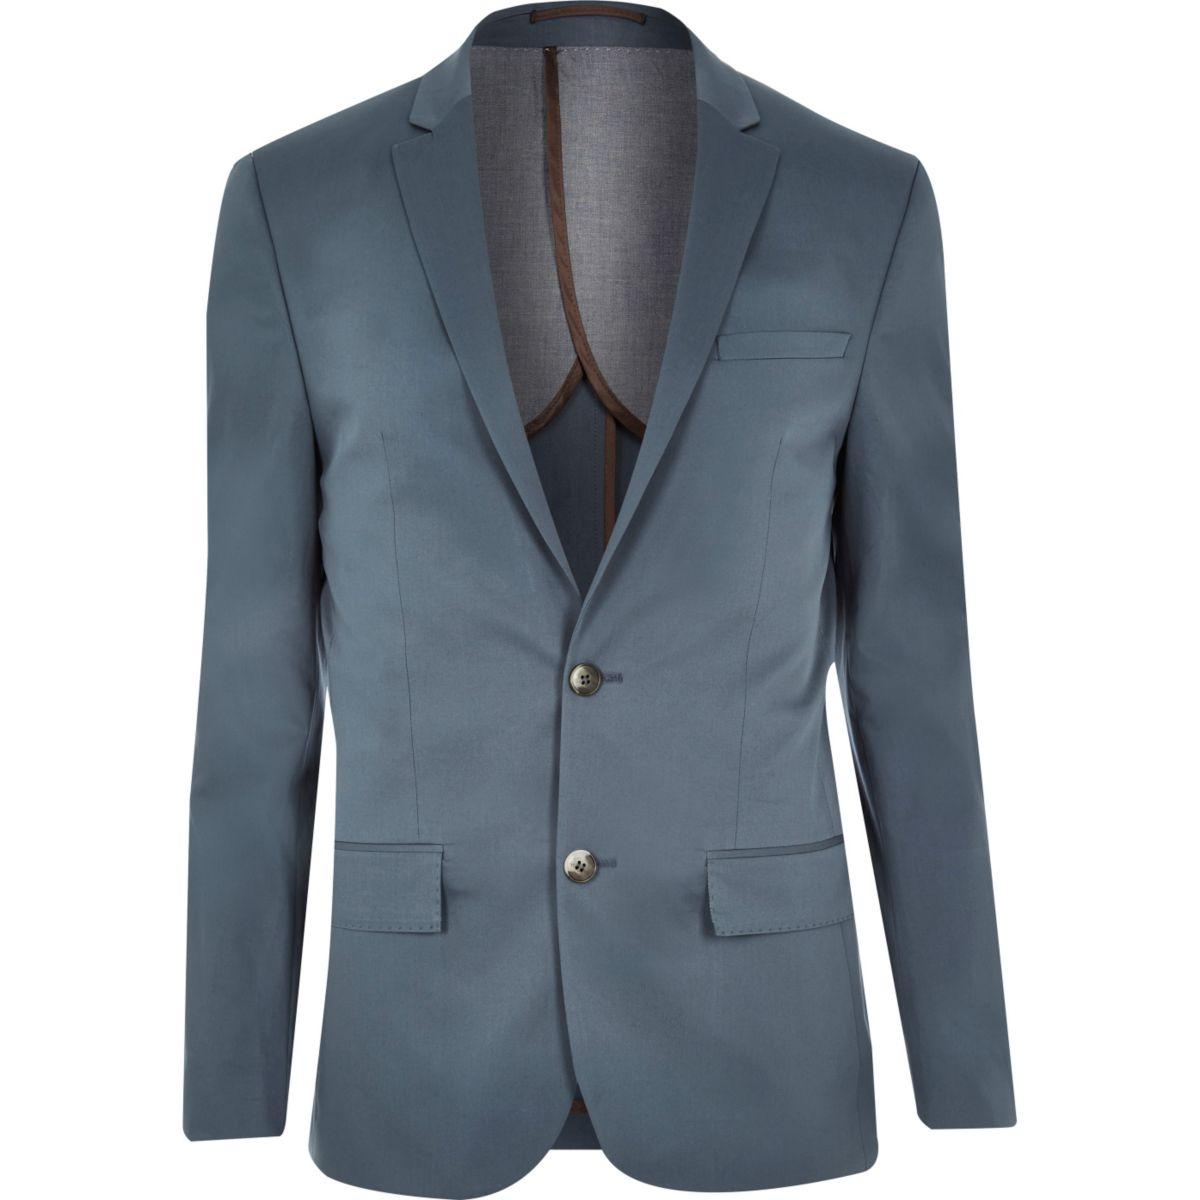 Veste de costume bleue cintrée